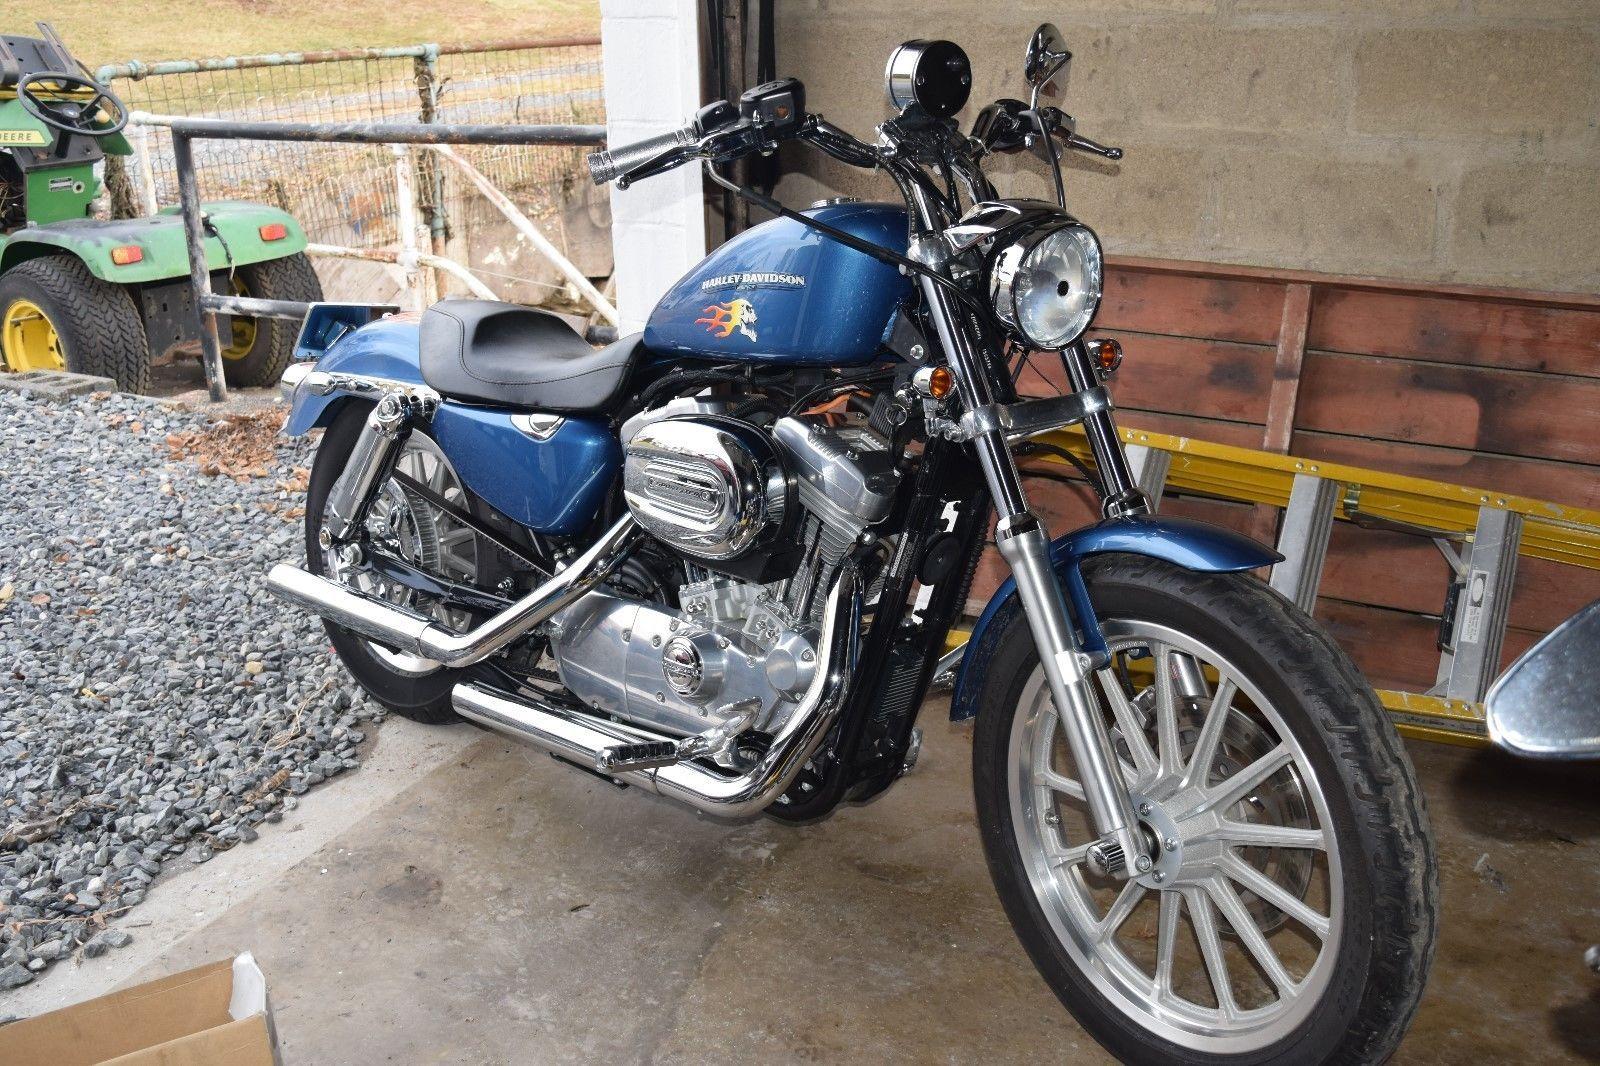 eBay: 2005 Harley-Davidson Sportster 05 HD 883 Low custom